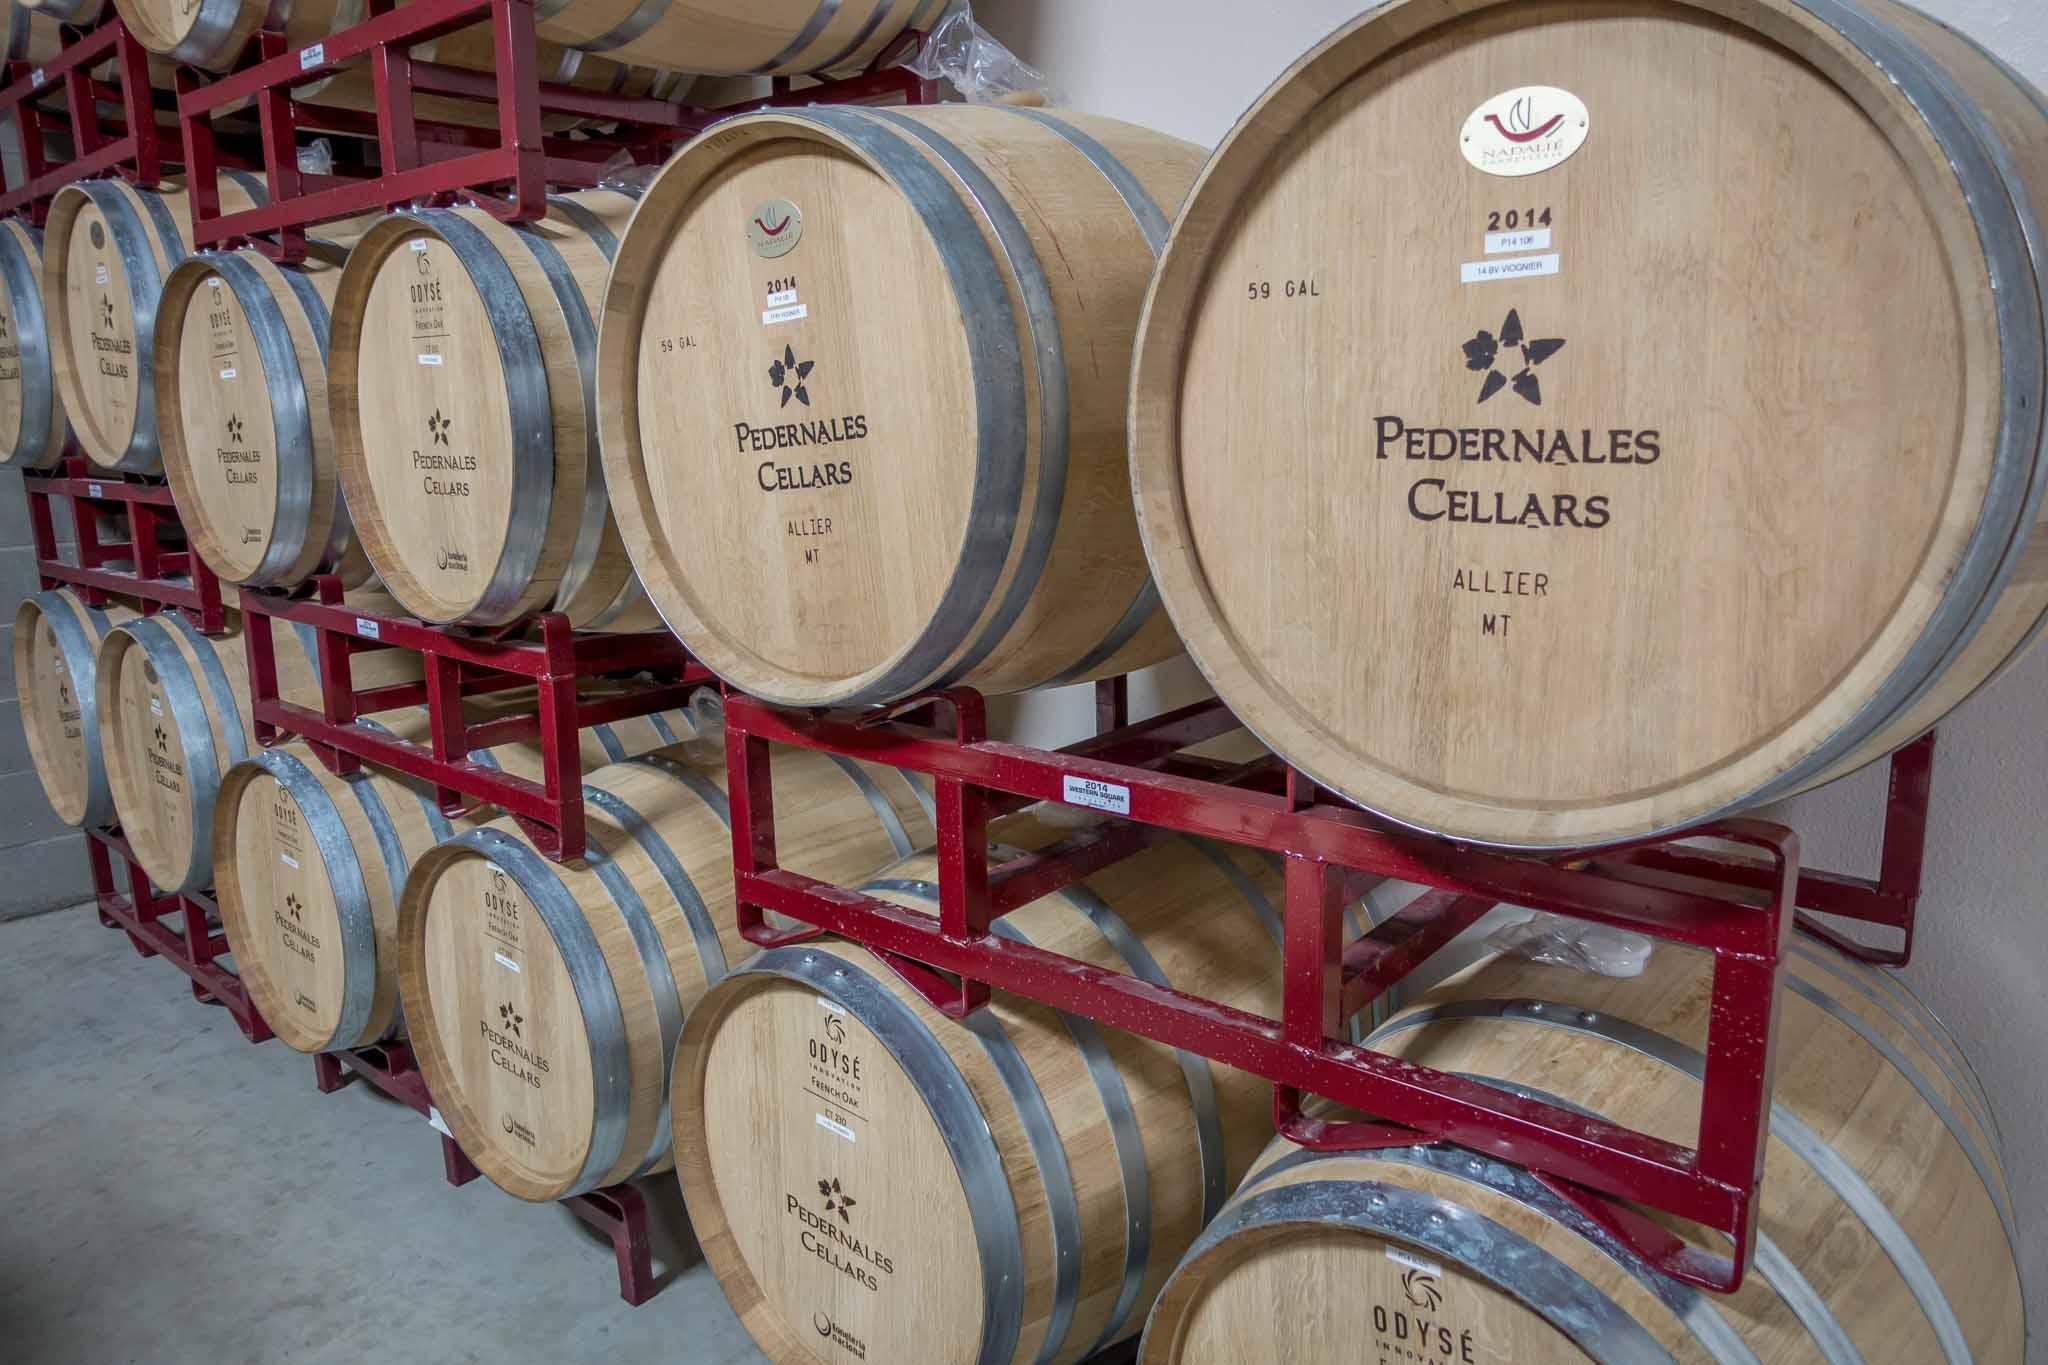 Stacked wine barrels at Pedernales Cellars